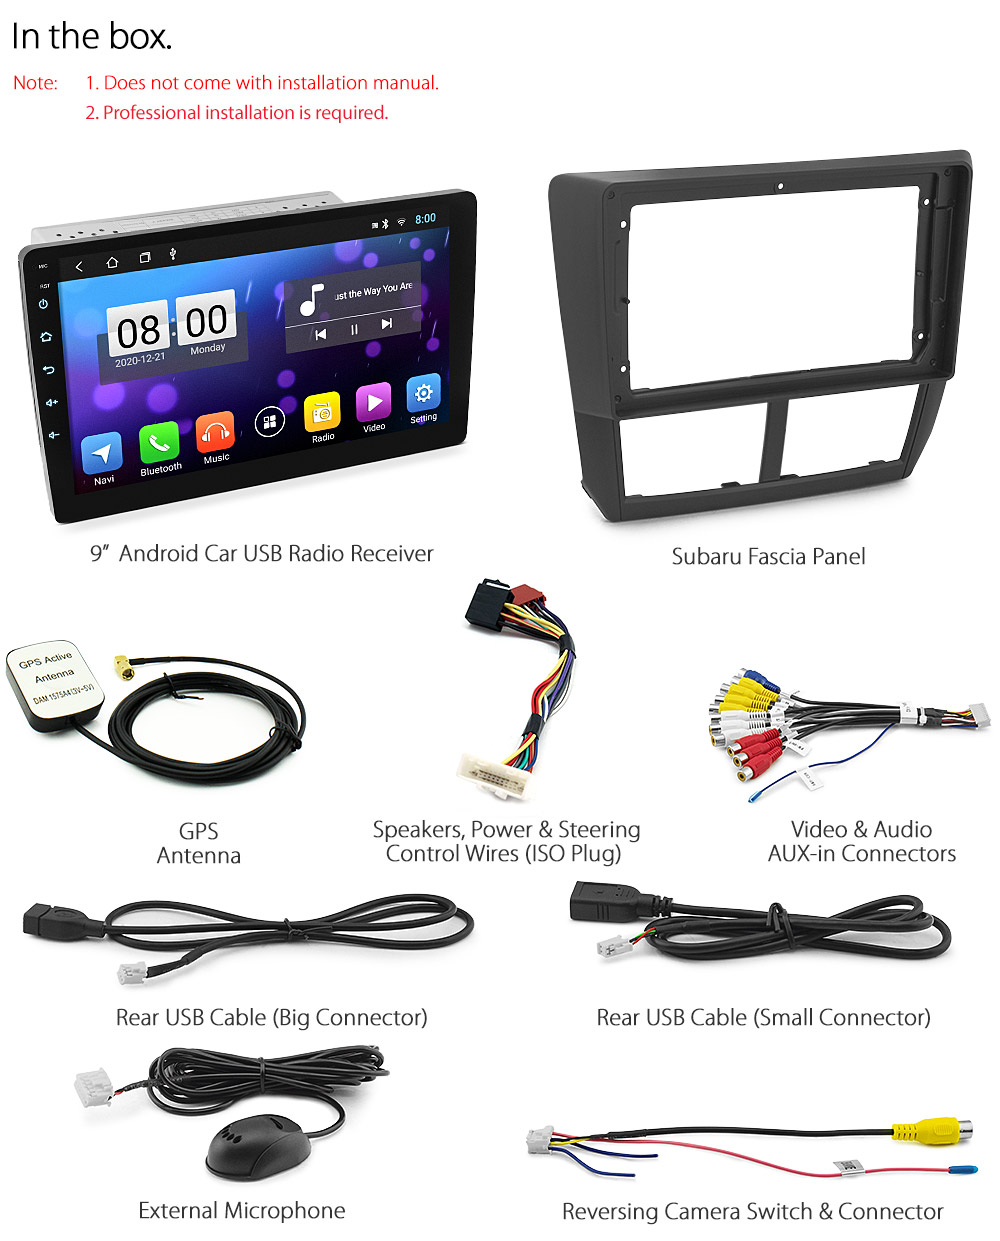 2009 subaru impreza stereo wiring harness 9  android car player mp3    subaru       impreza    g3 2007 2013  9  android car player mp3    subaru       impreza    g3 2007 2013